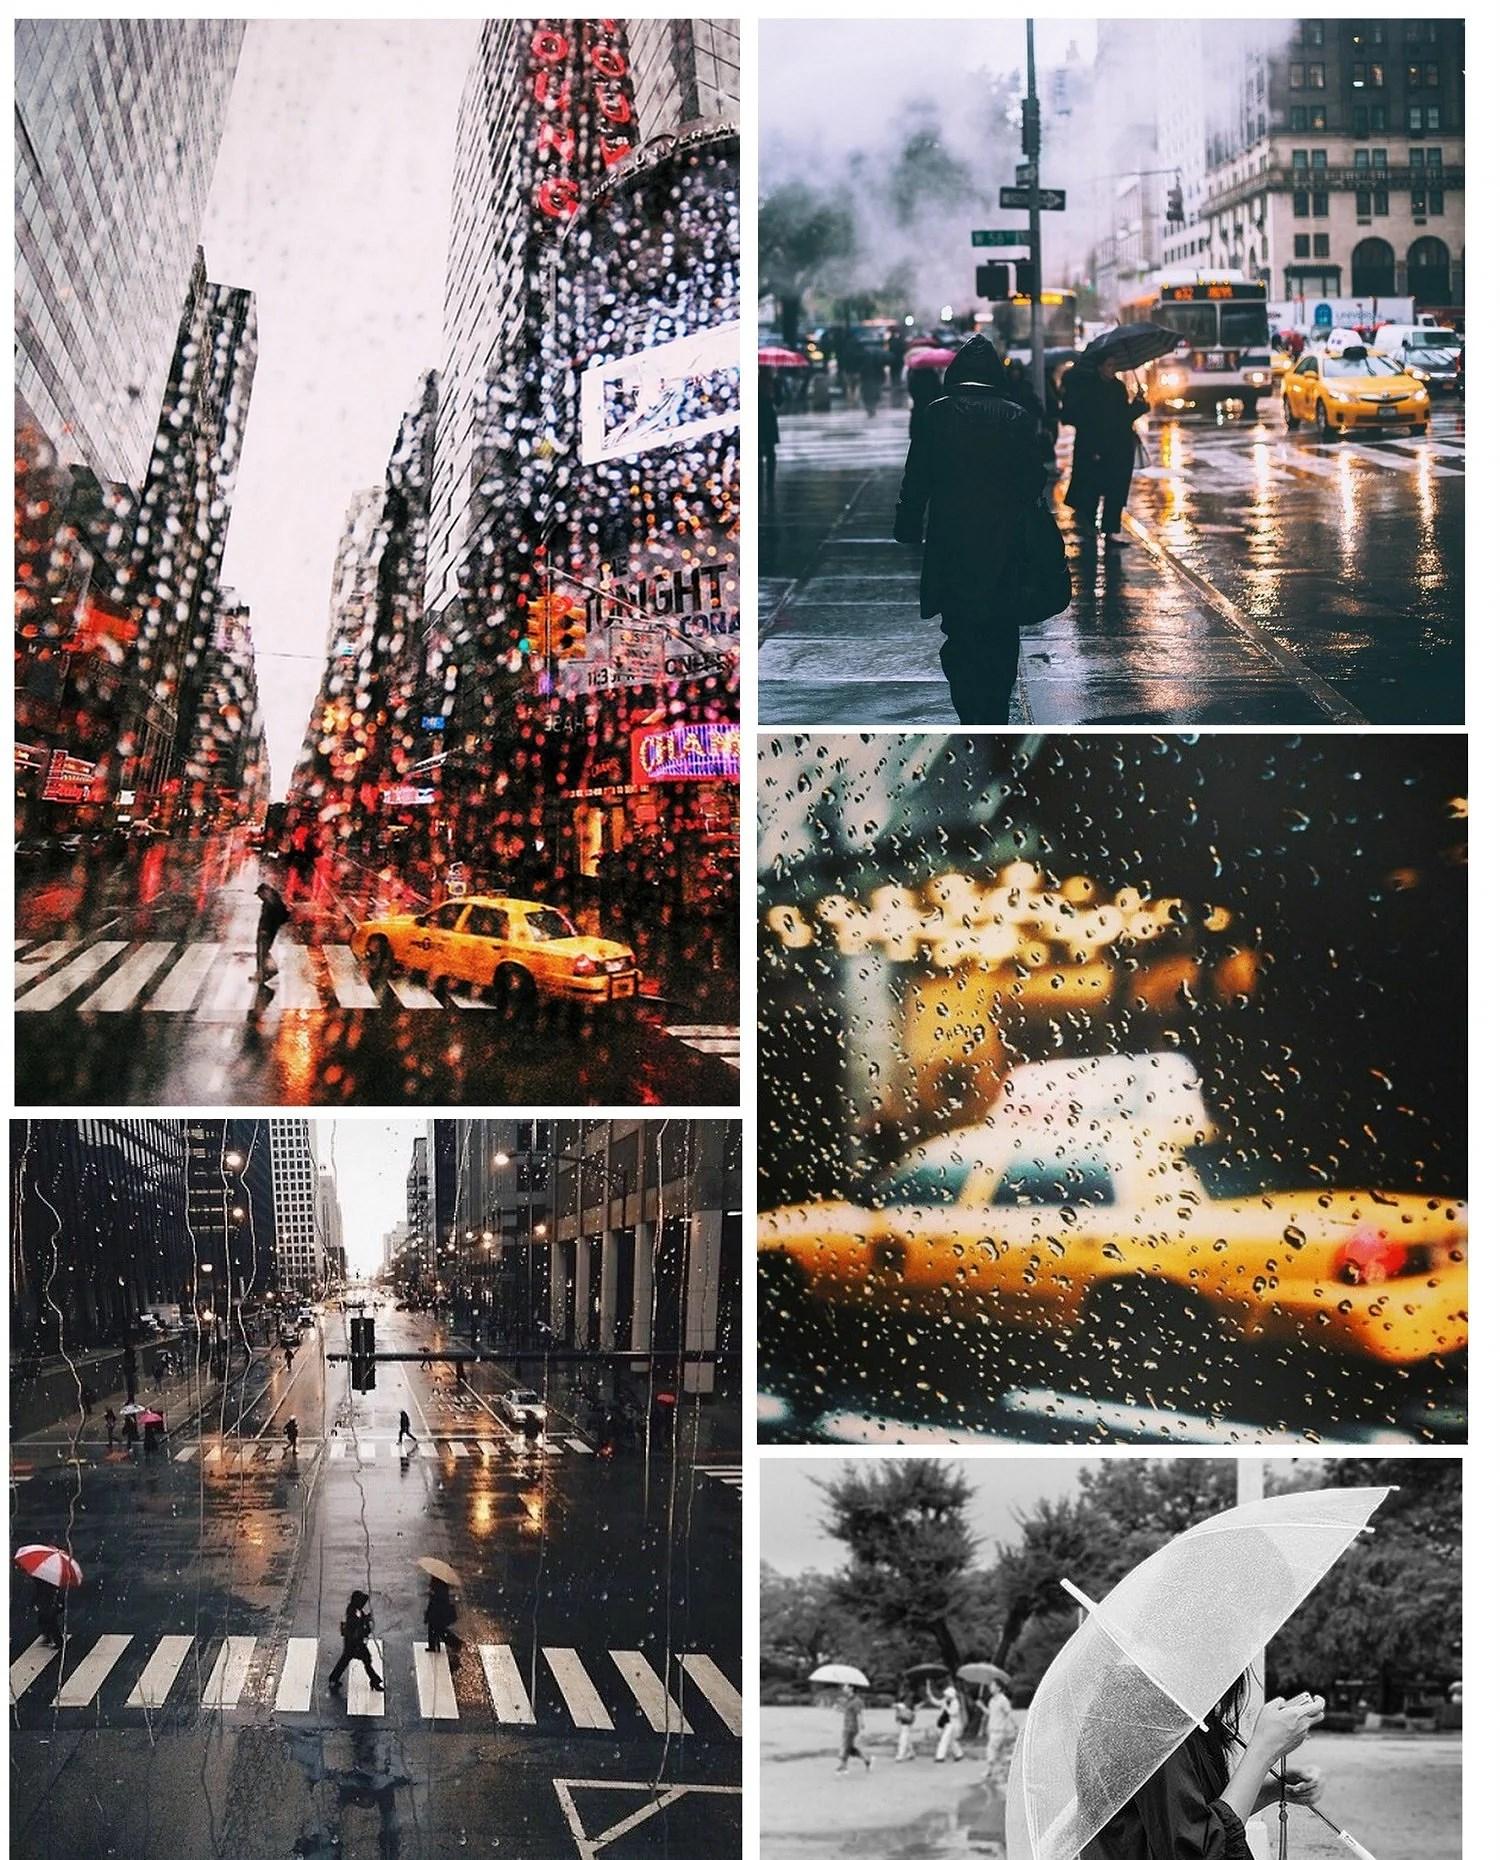 regn, regn, regn